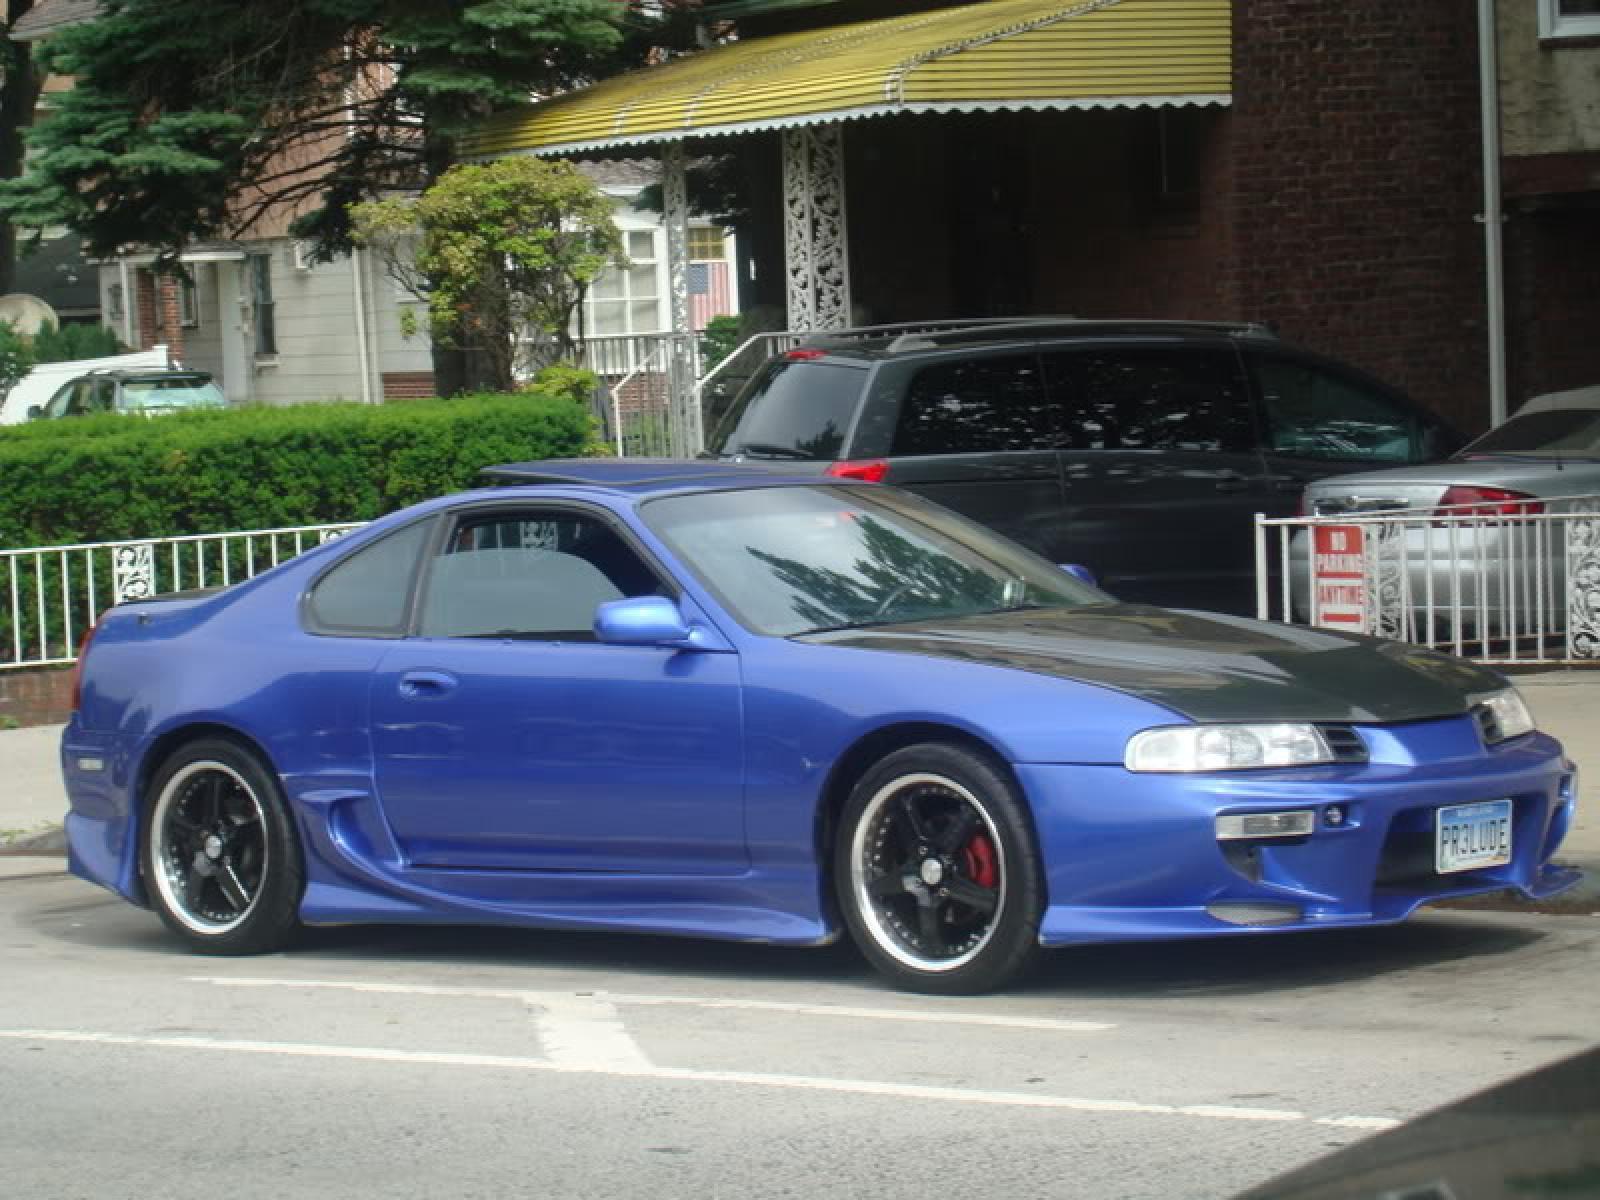 800 1024 1280 1600 Origin 1992 Honda Prelude ...